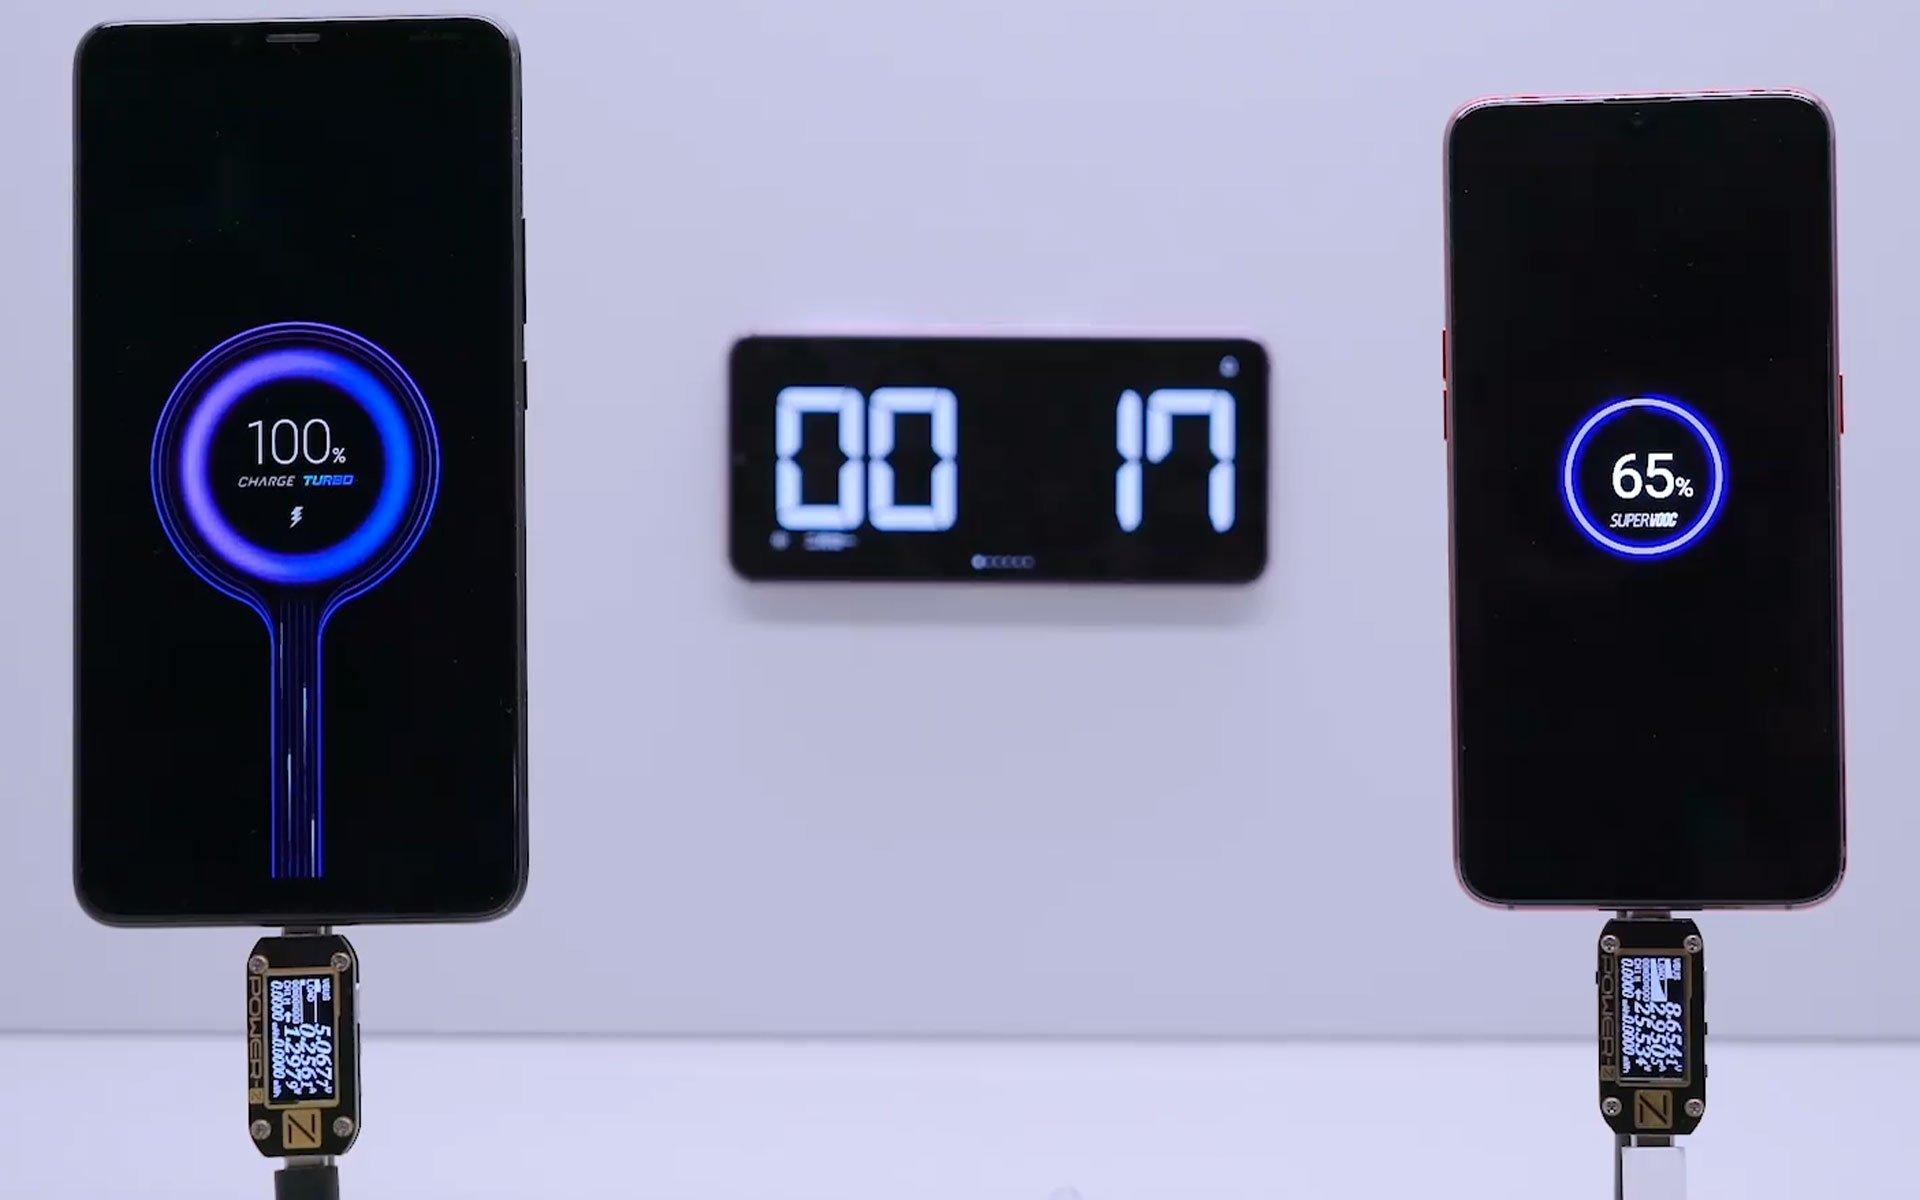 Xiaomi smartphone carregamento rapido